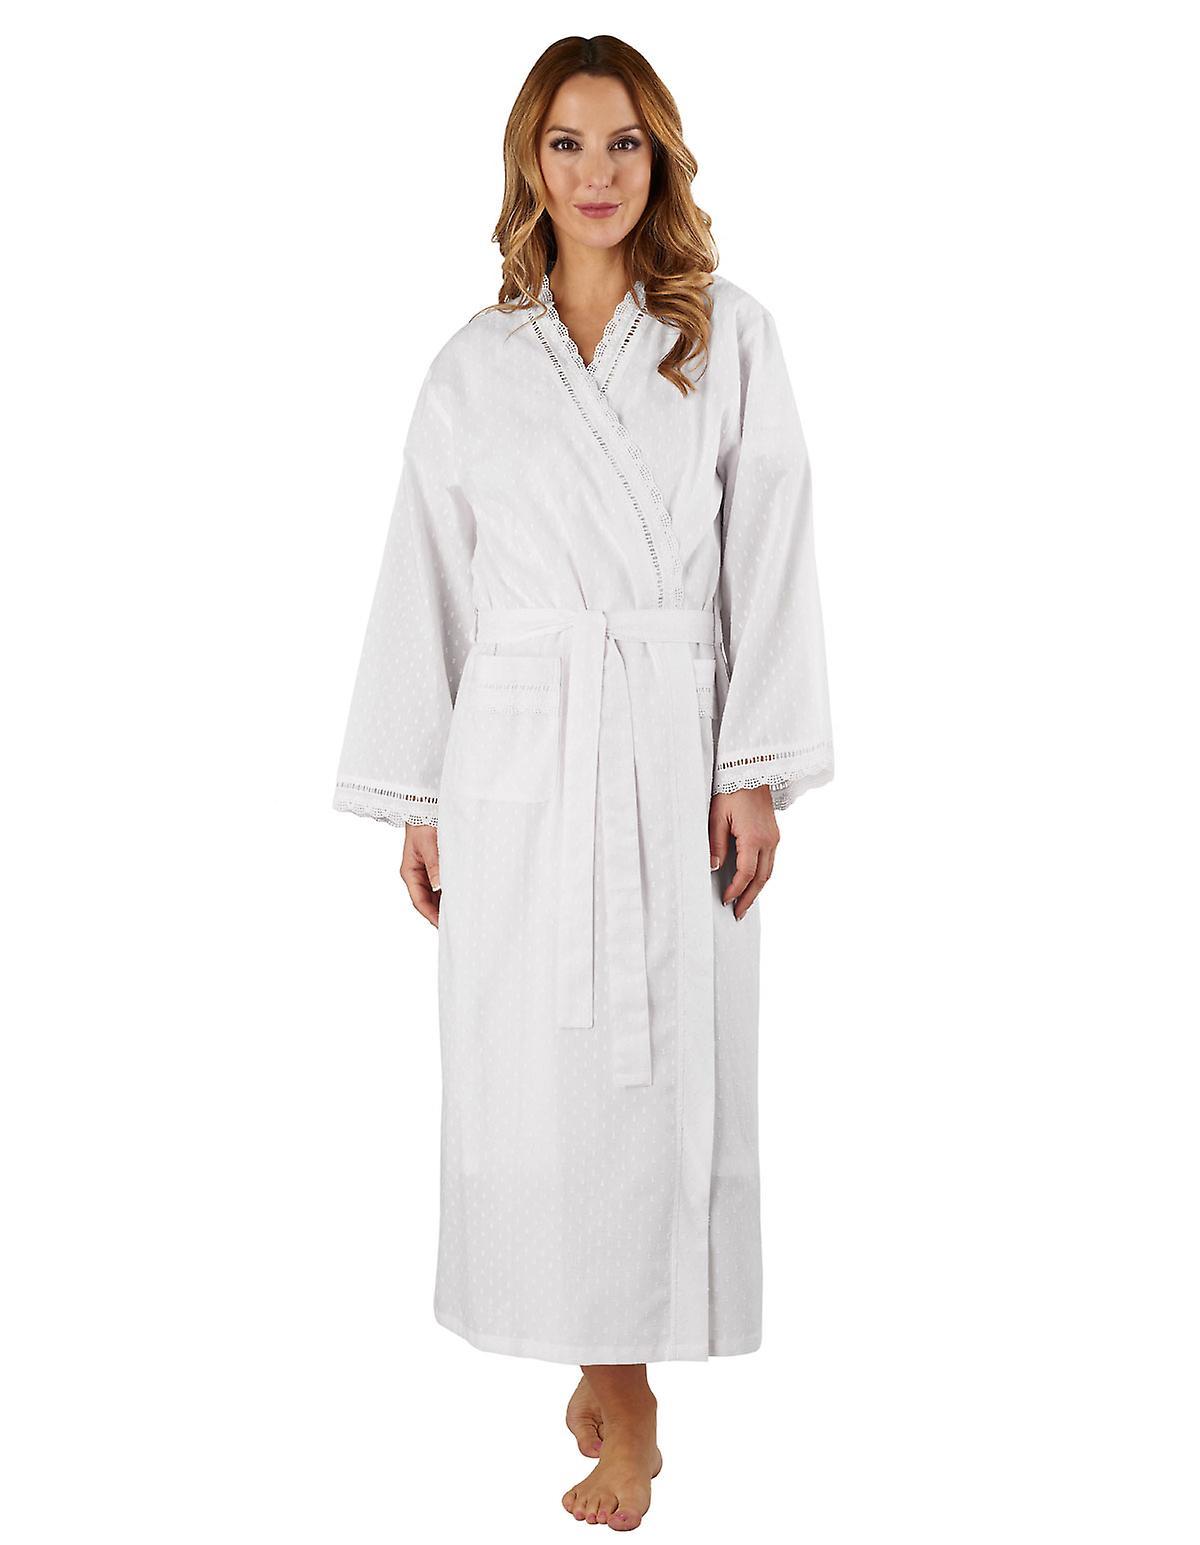 Slenderella HC3234L femmes& 039;s Cotton Woven blanc Robeing Gown Loungewear Bath Robe Kimono